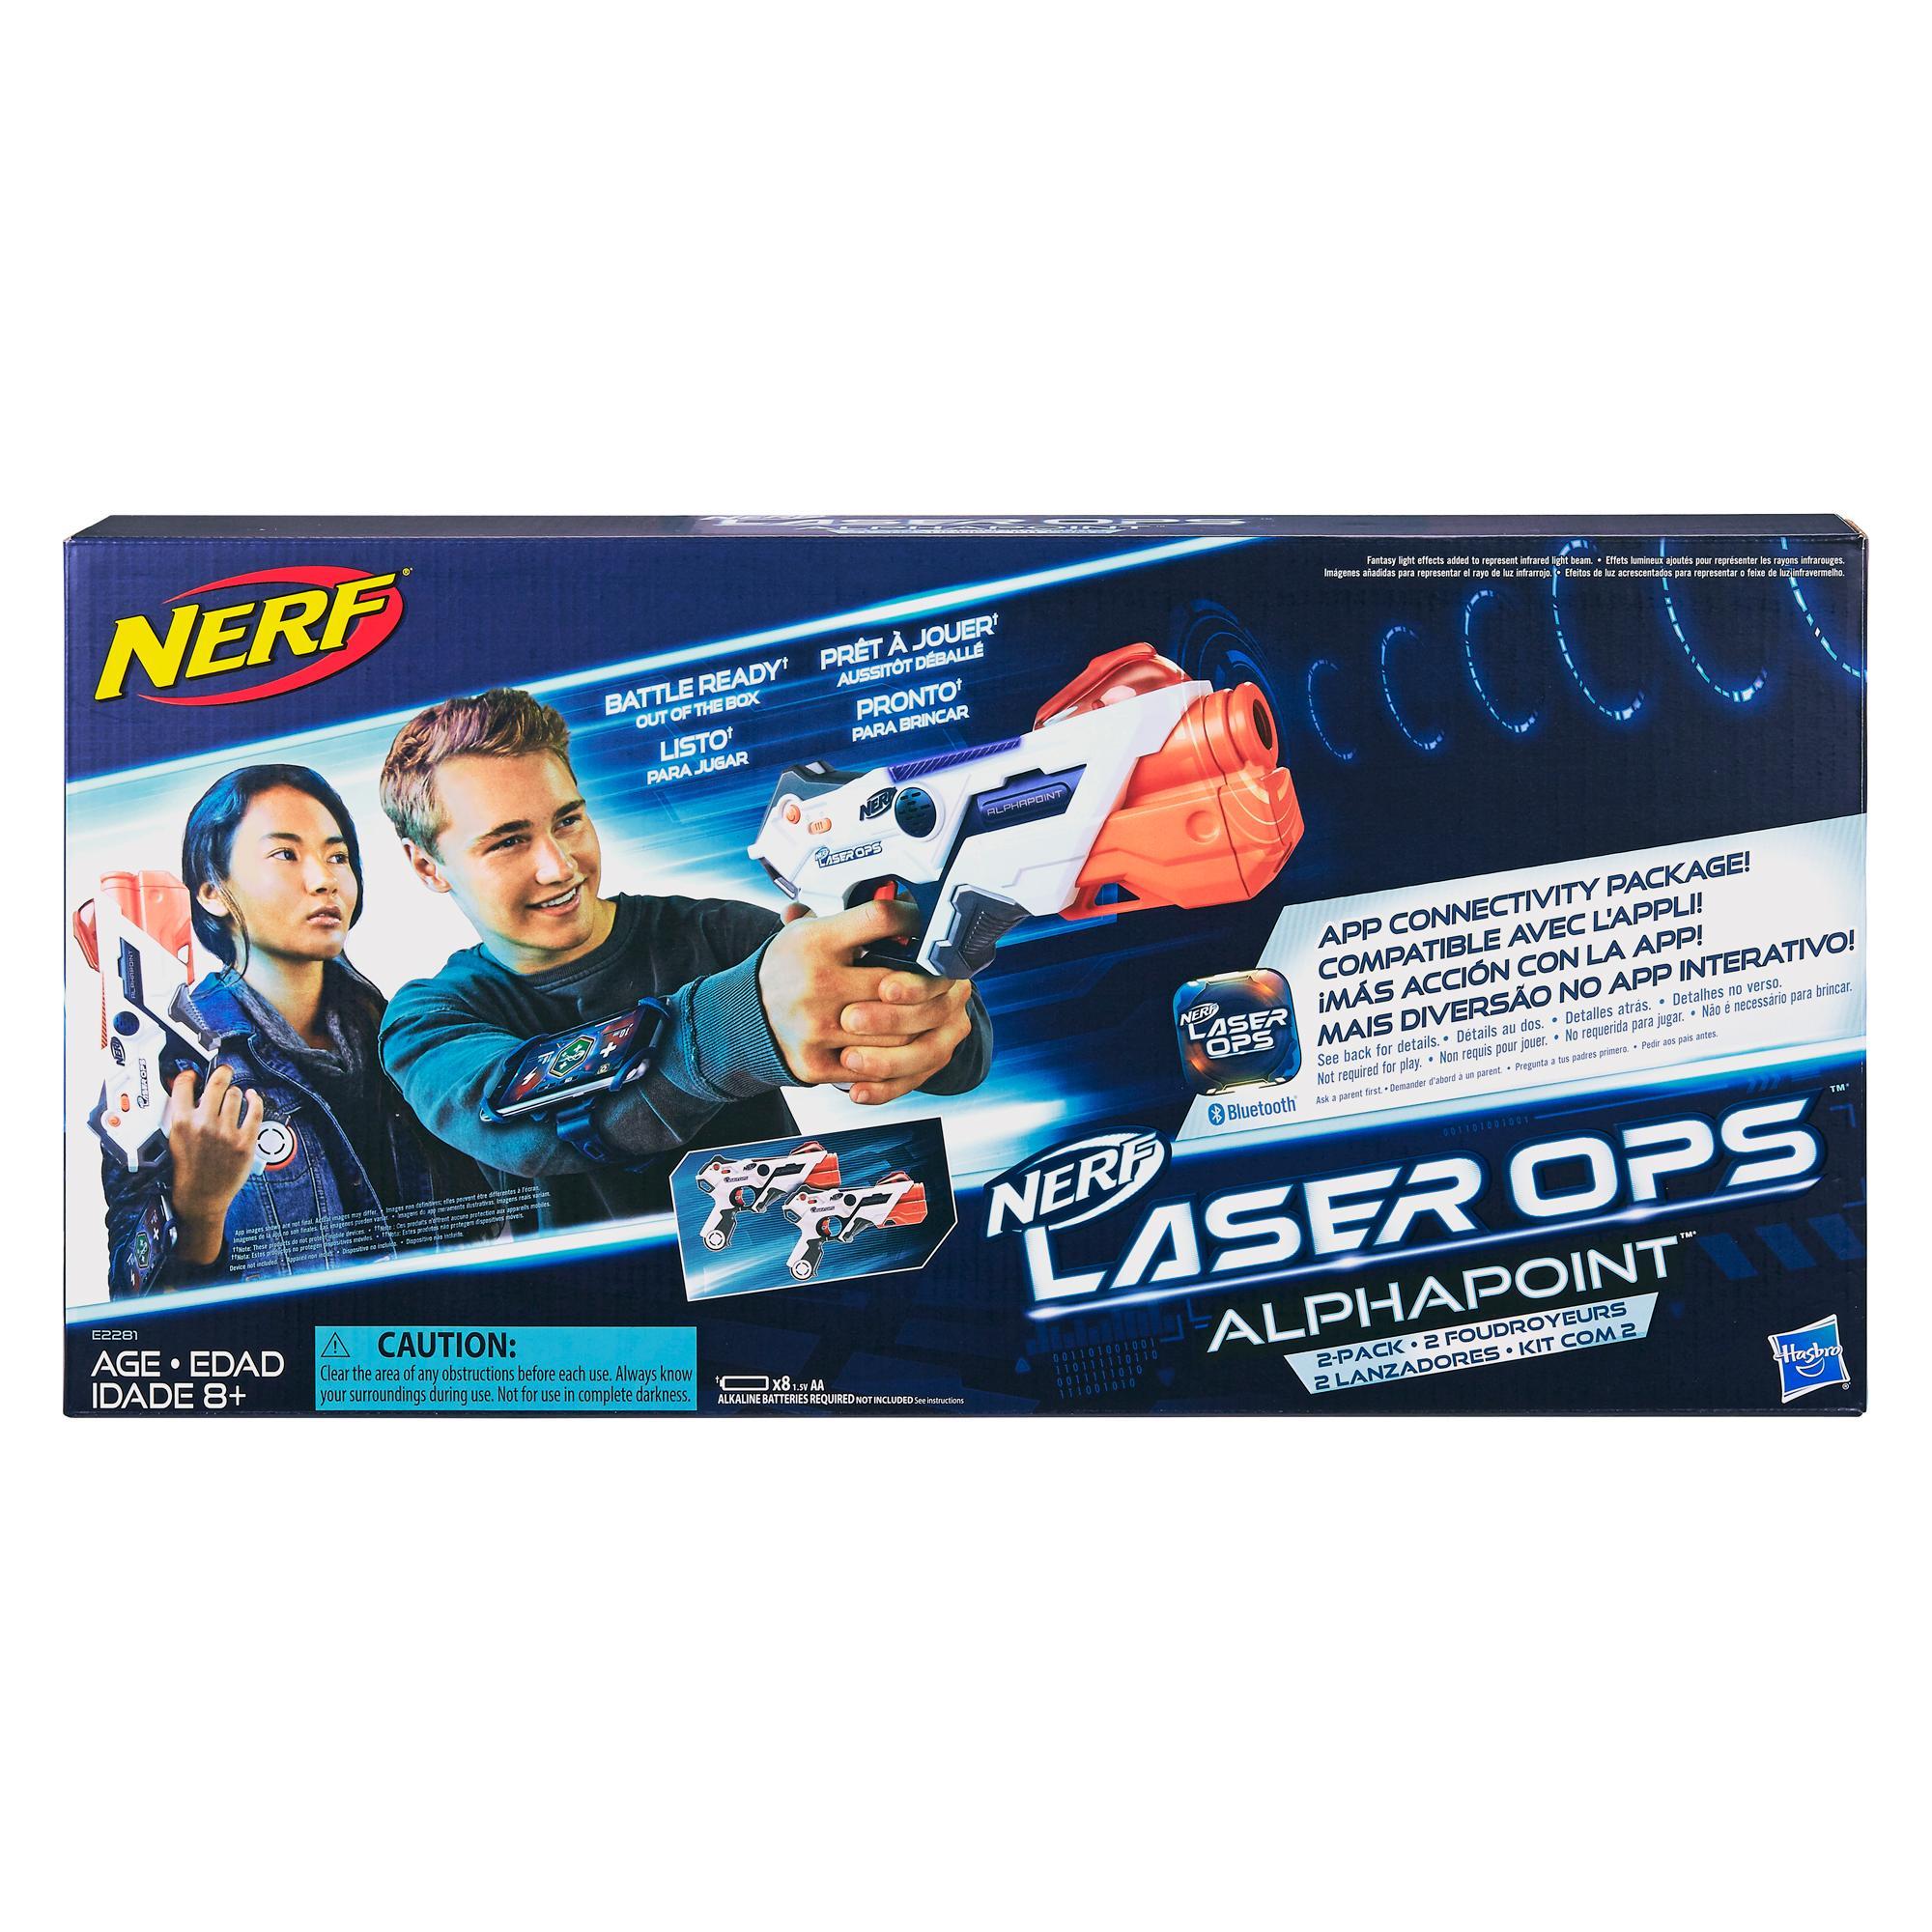 Pack de 2 Nerf Laser Ops Pro AlphaPoint